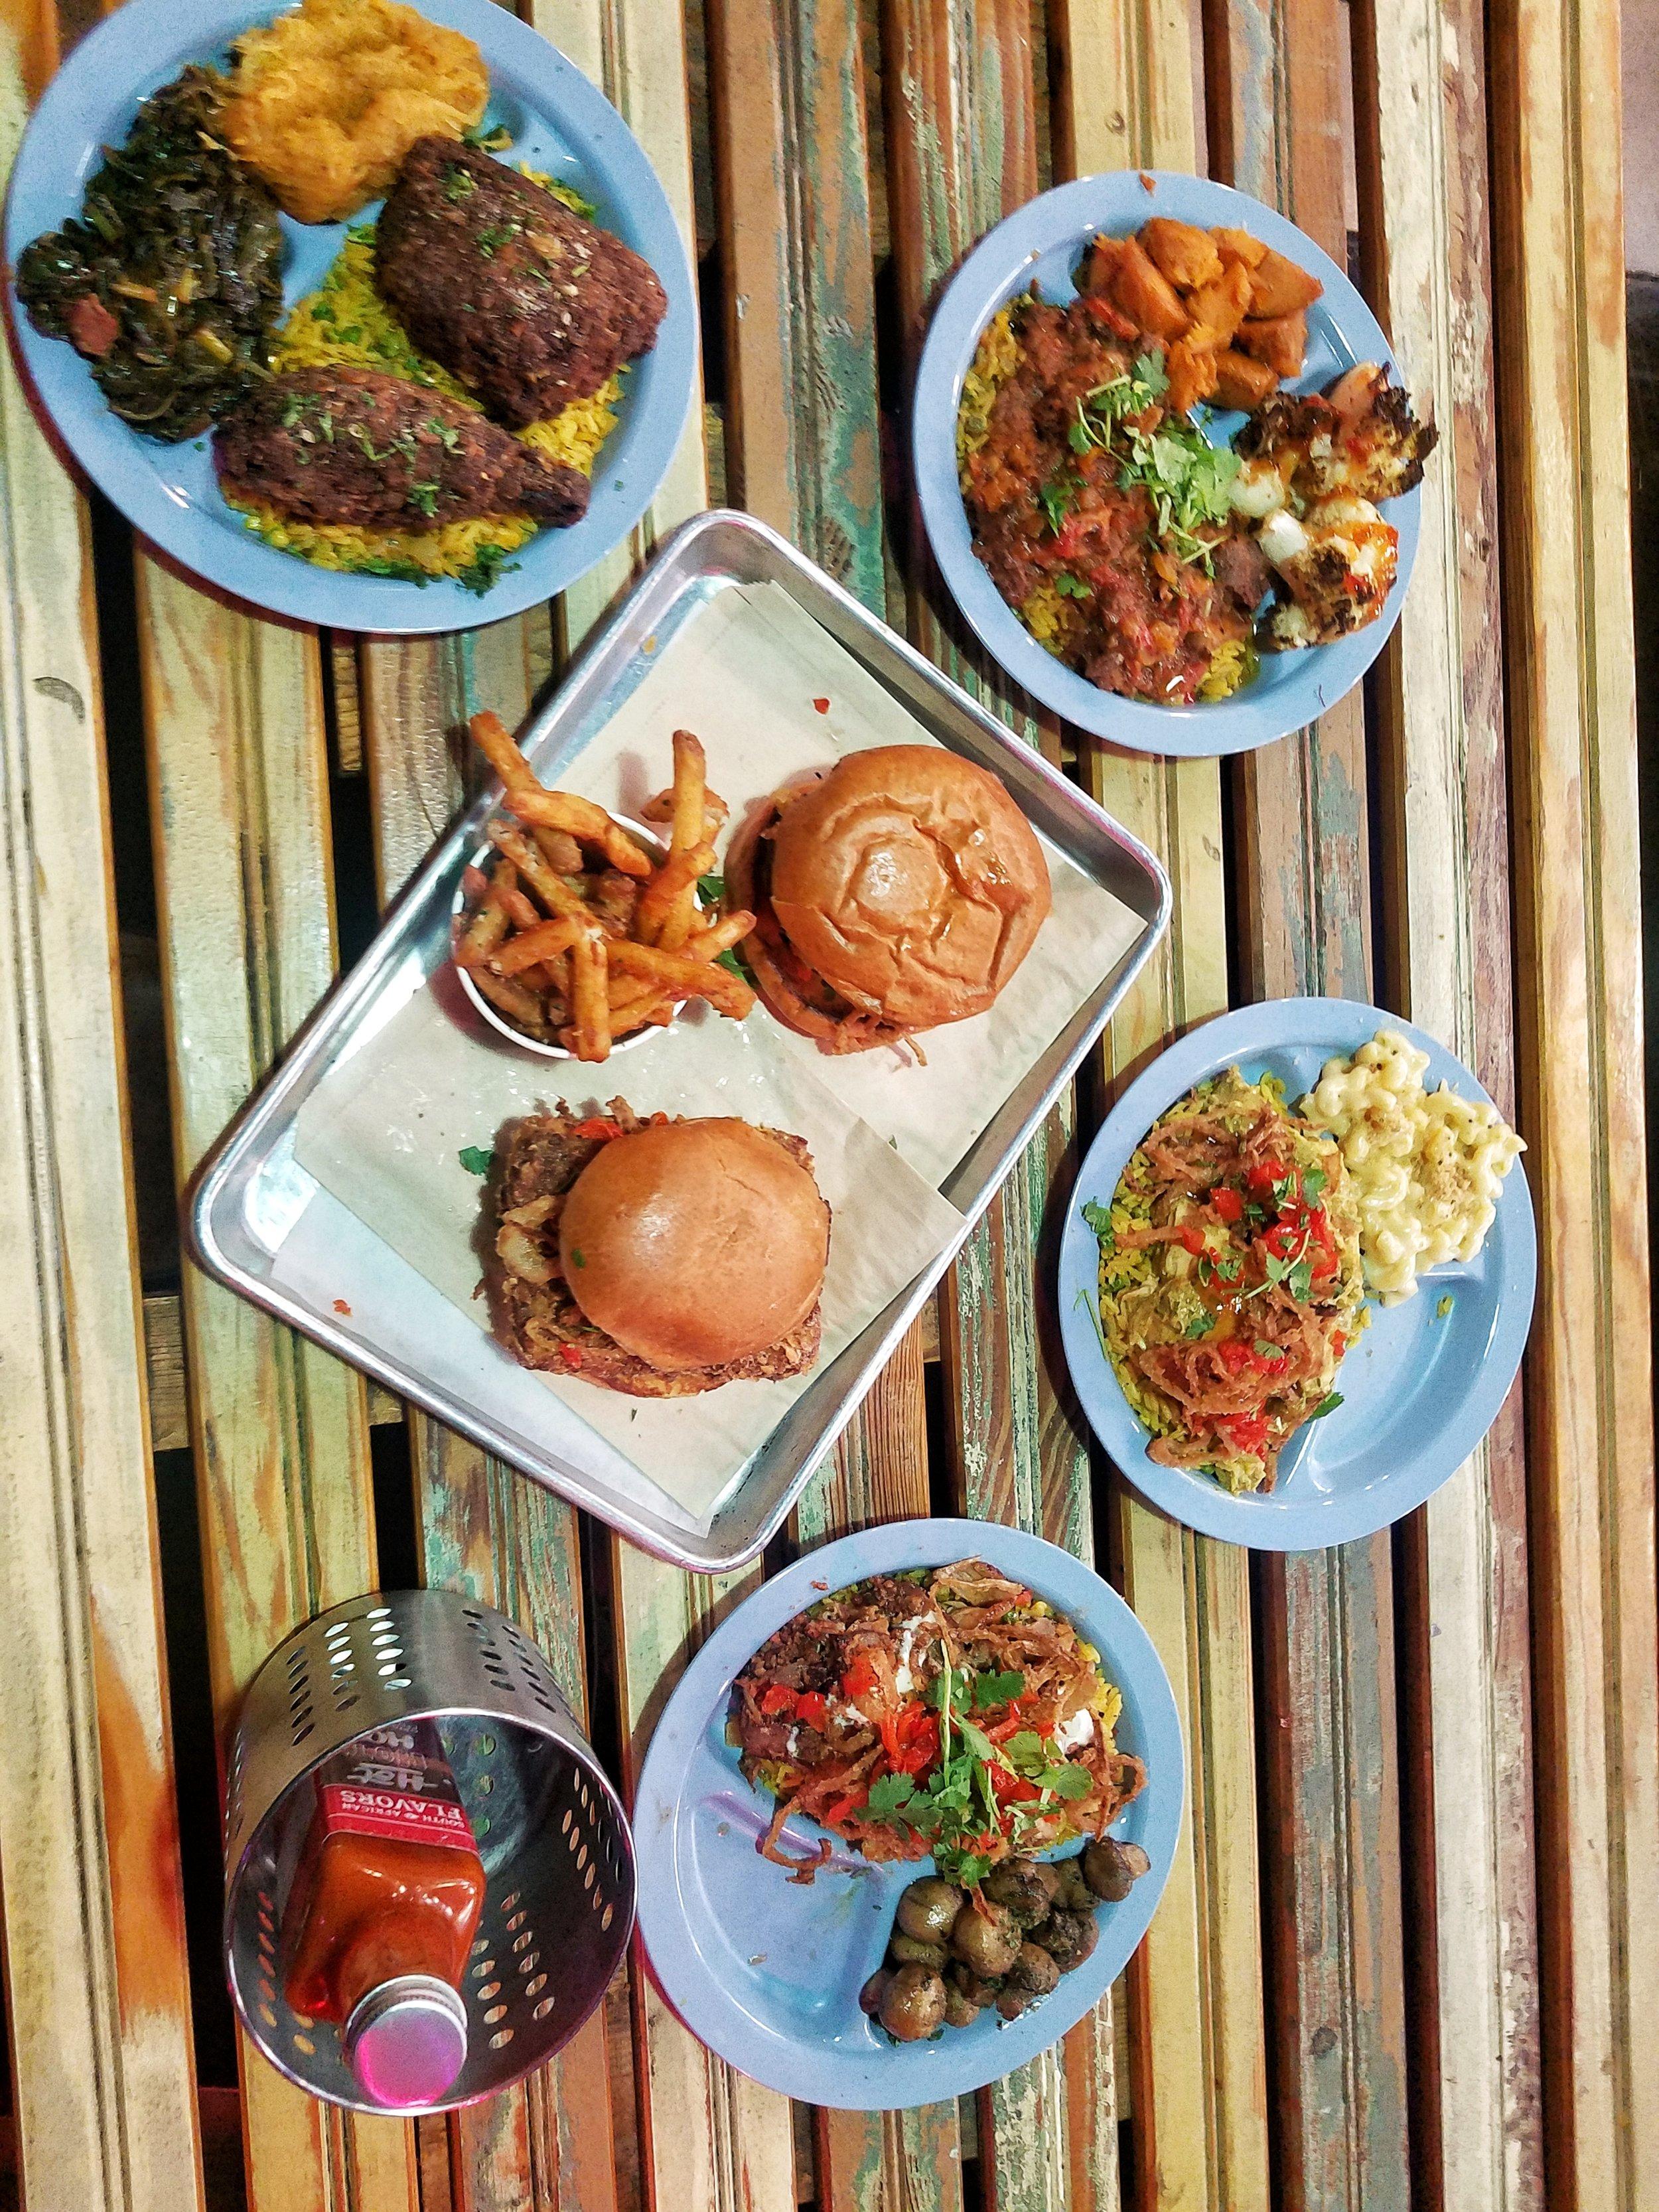 peli-peli-kitchen-variety-of-menu-items-south-african-houston